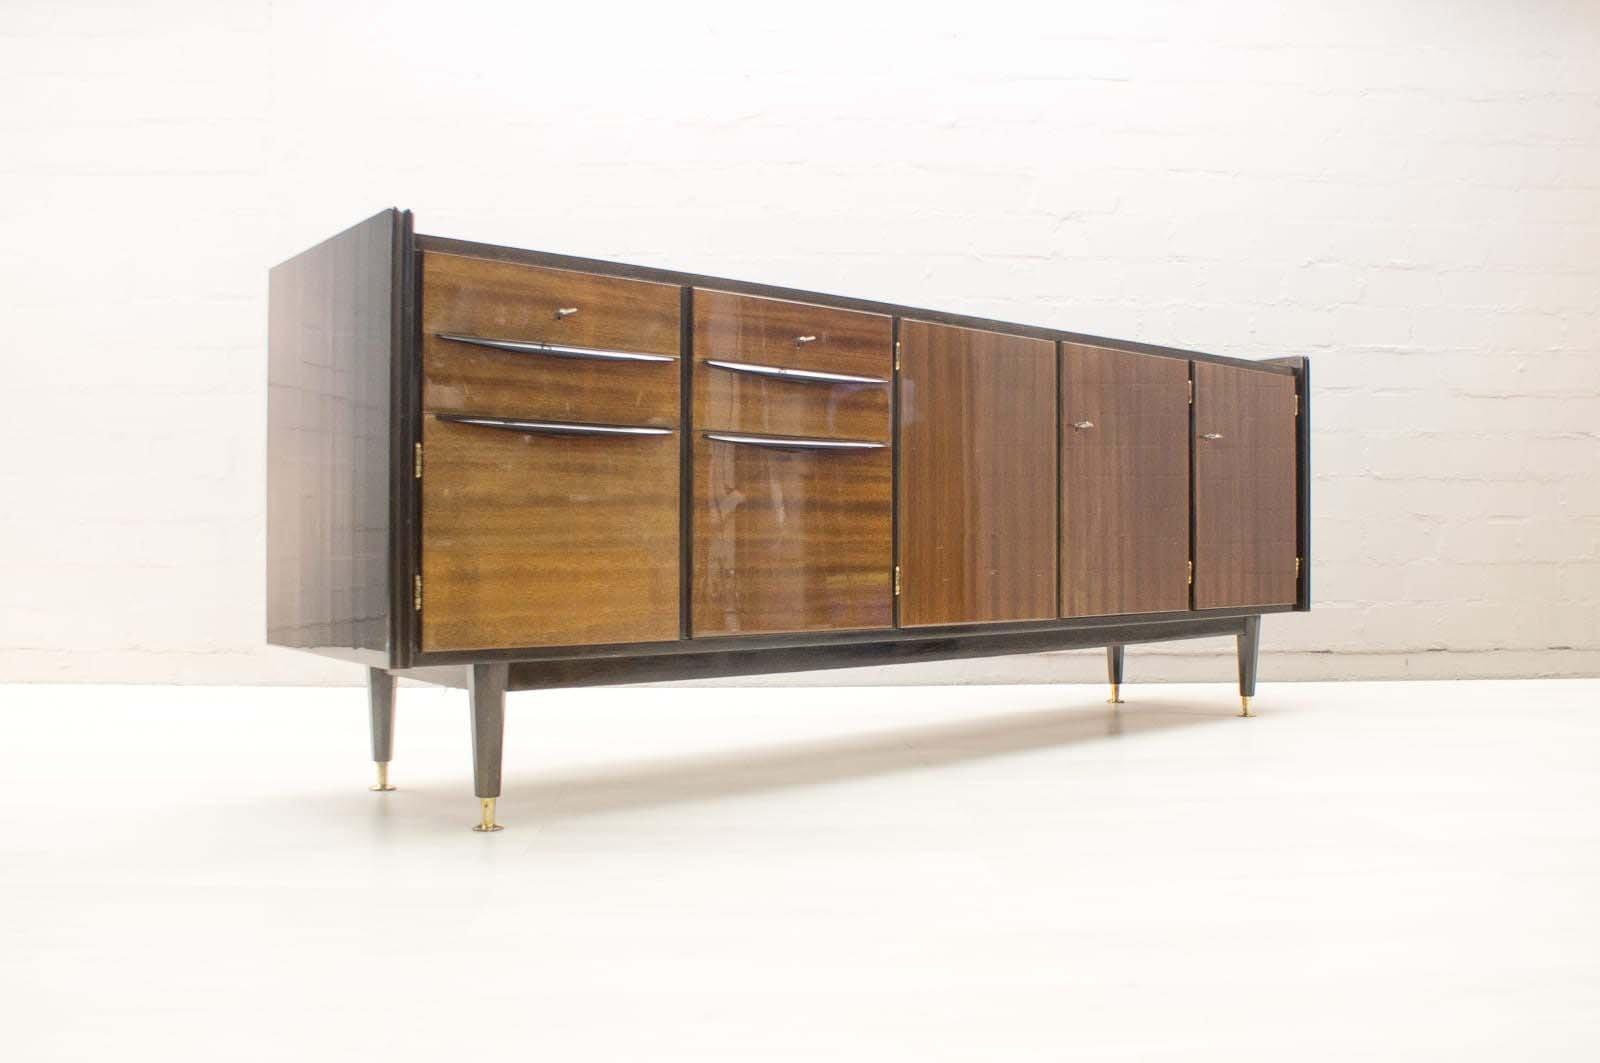 gro es mid century sideboard mit beleuchteter bar bei. Black Bedroom Furniture Sets. Home Design Ideas